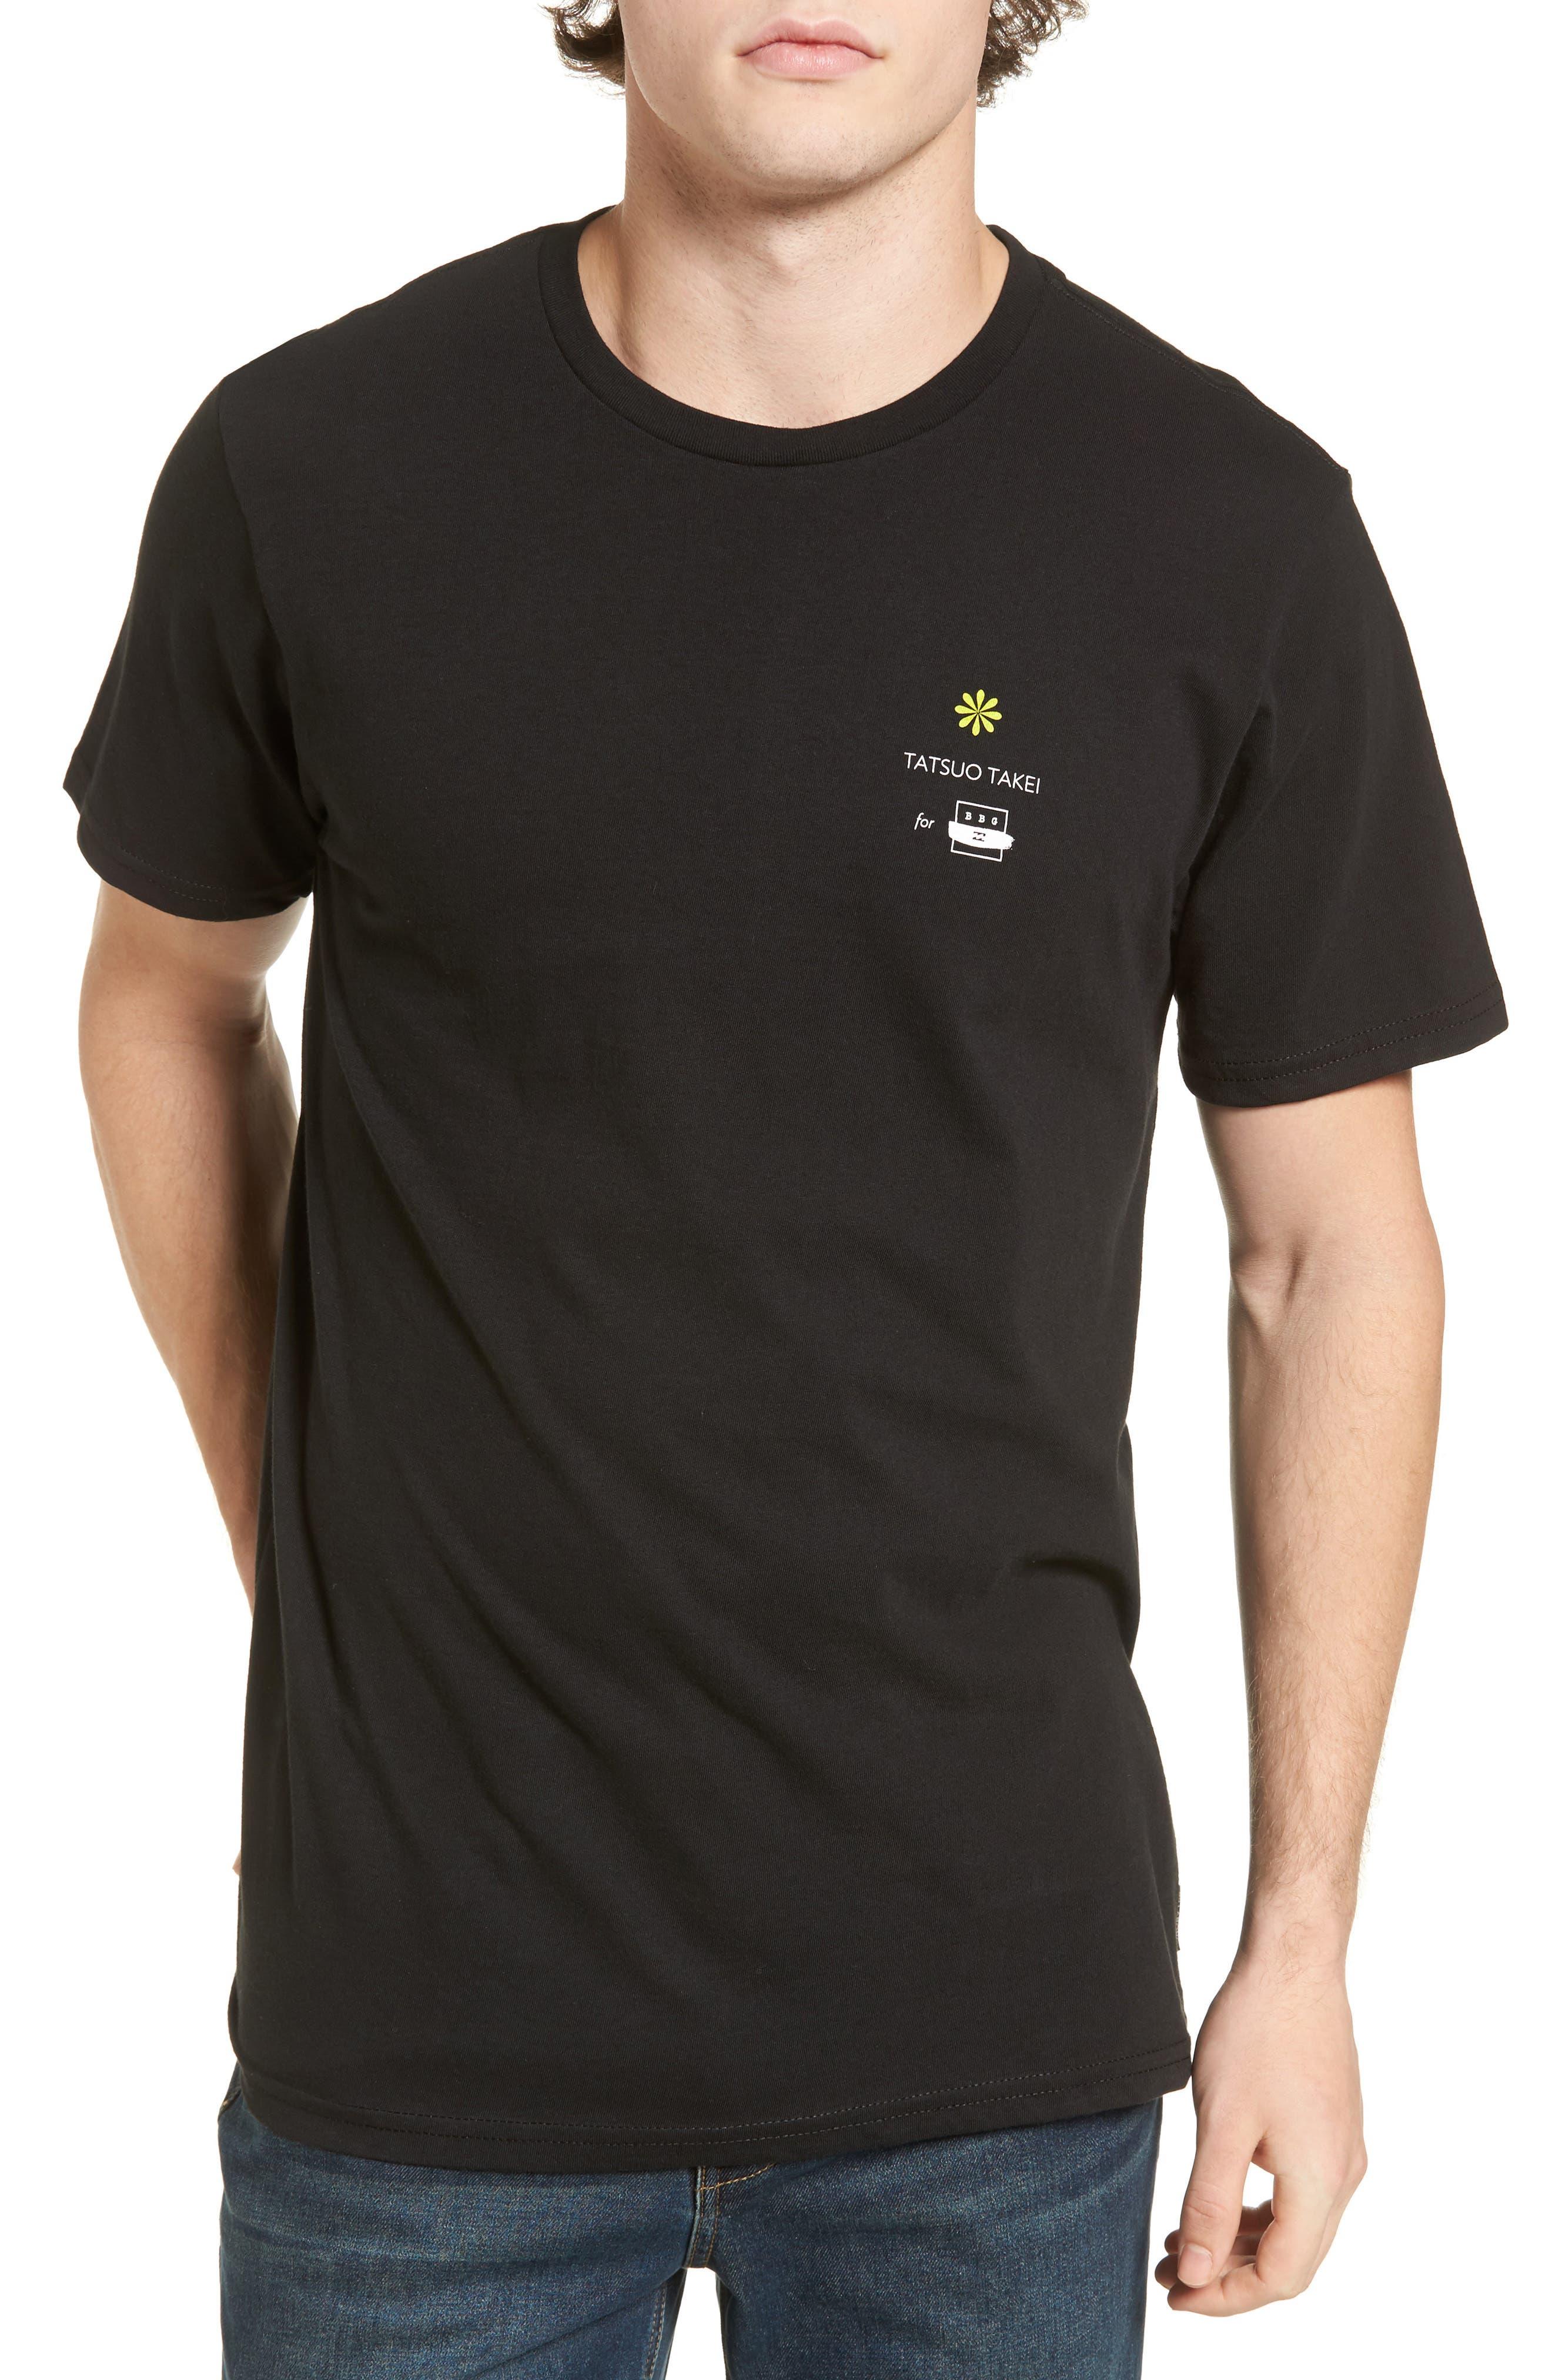 Offshore T-Shirt,                             Main thumbnail 1, color,                             Black